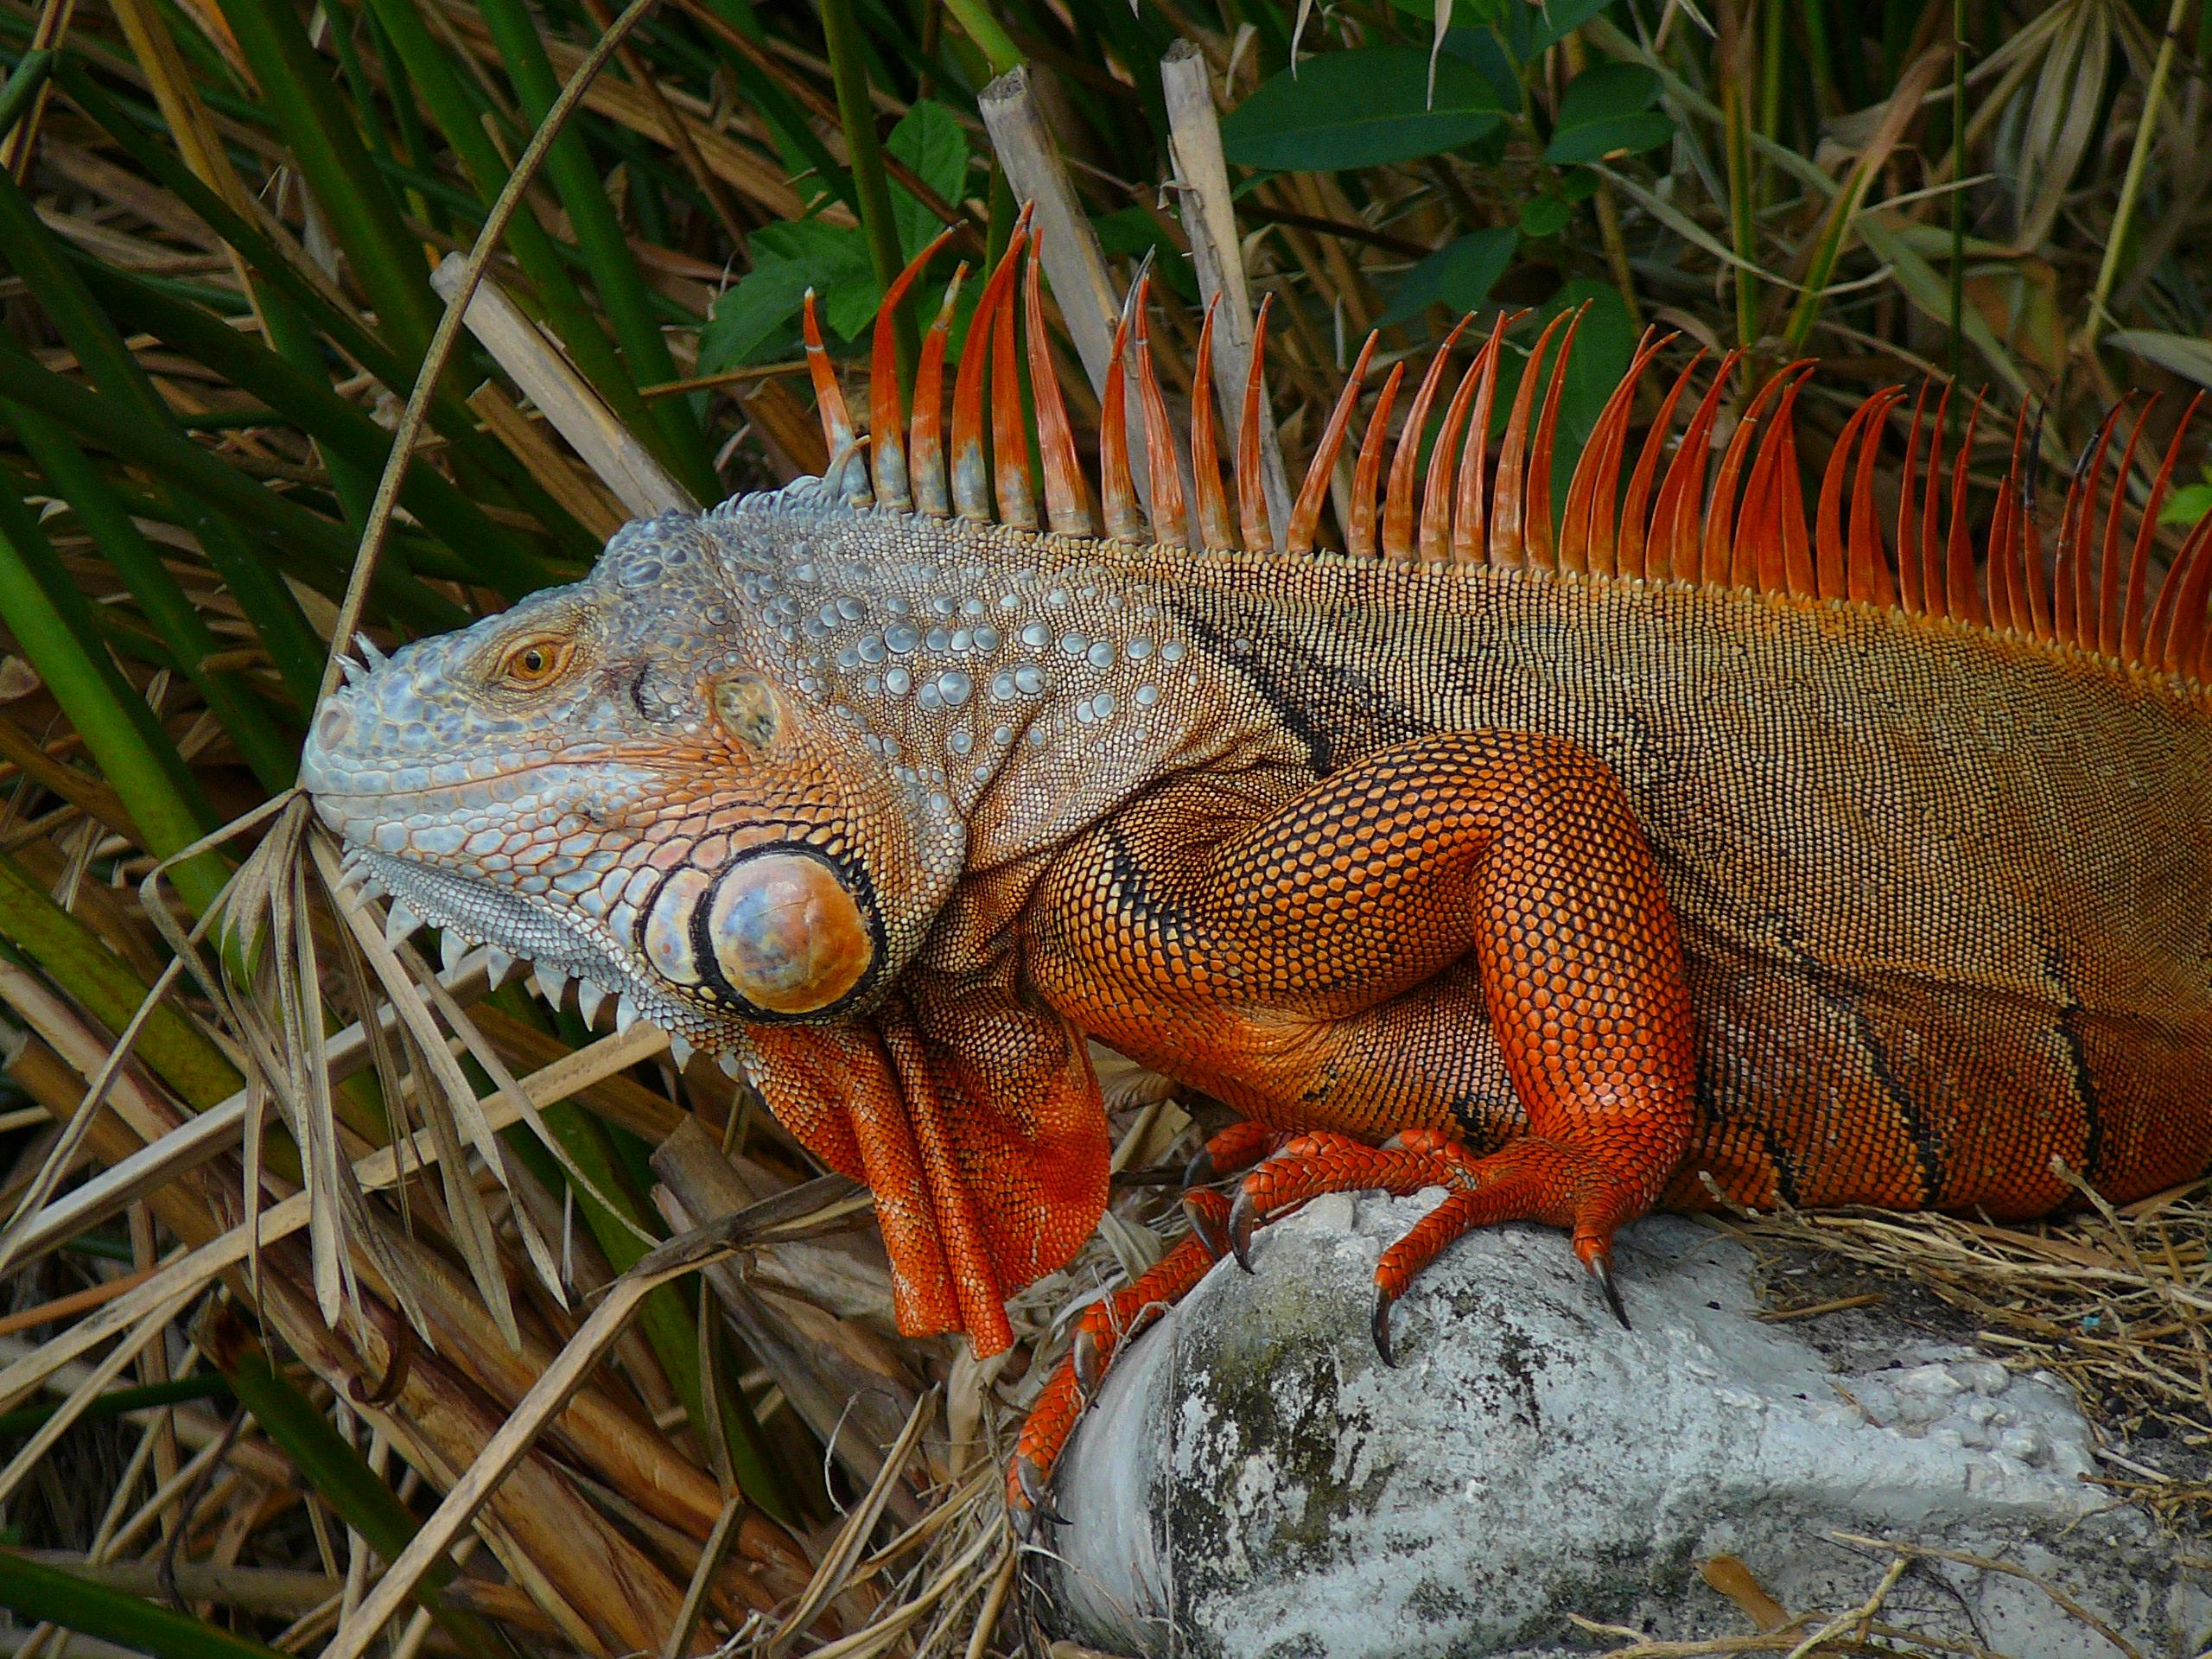 Reddish colored green iguana